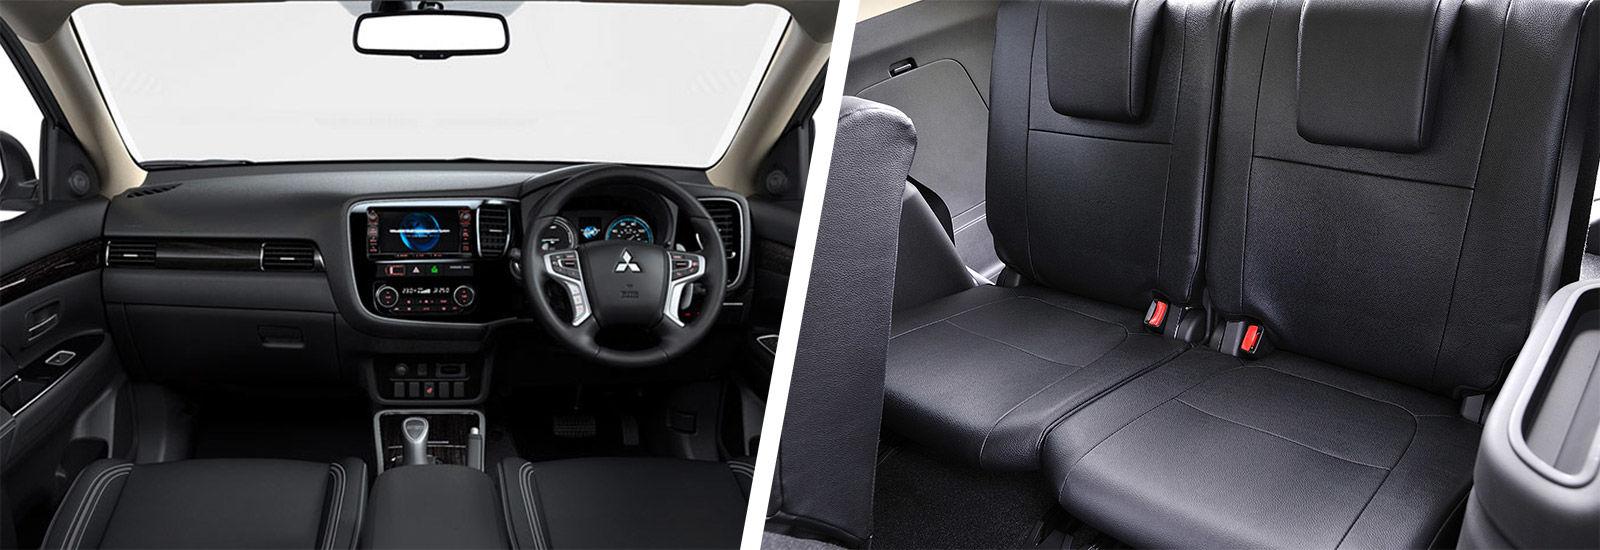 Mitsubishi Outlander Phev Sizes Dimensions Carwow